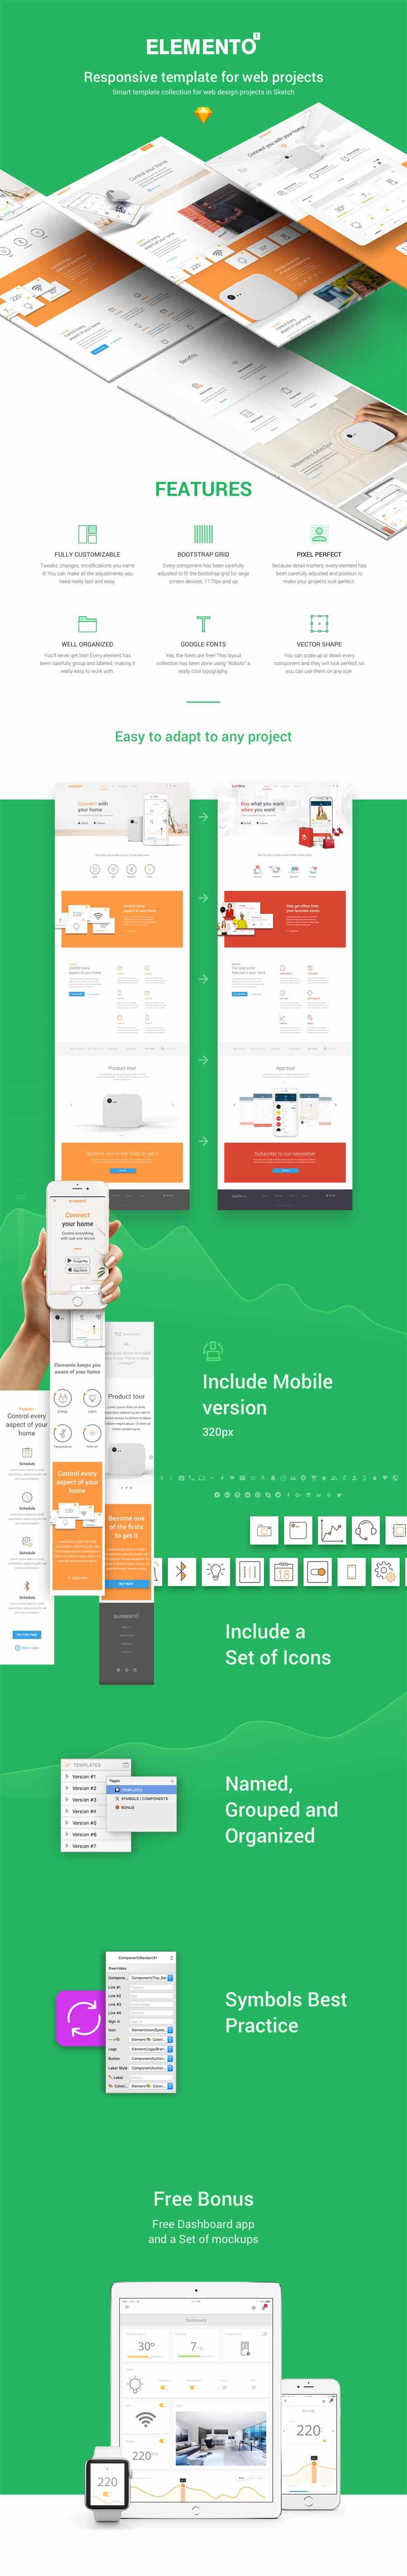 Elemento – App Landing Page Website Template Mockup